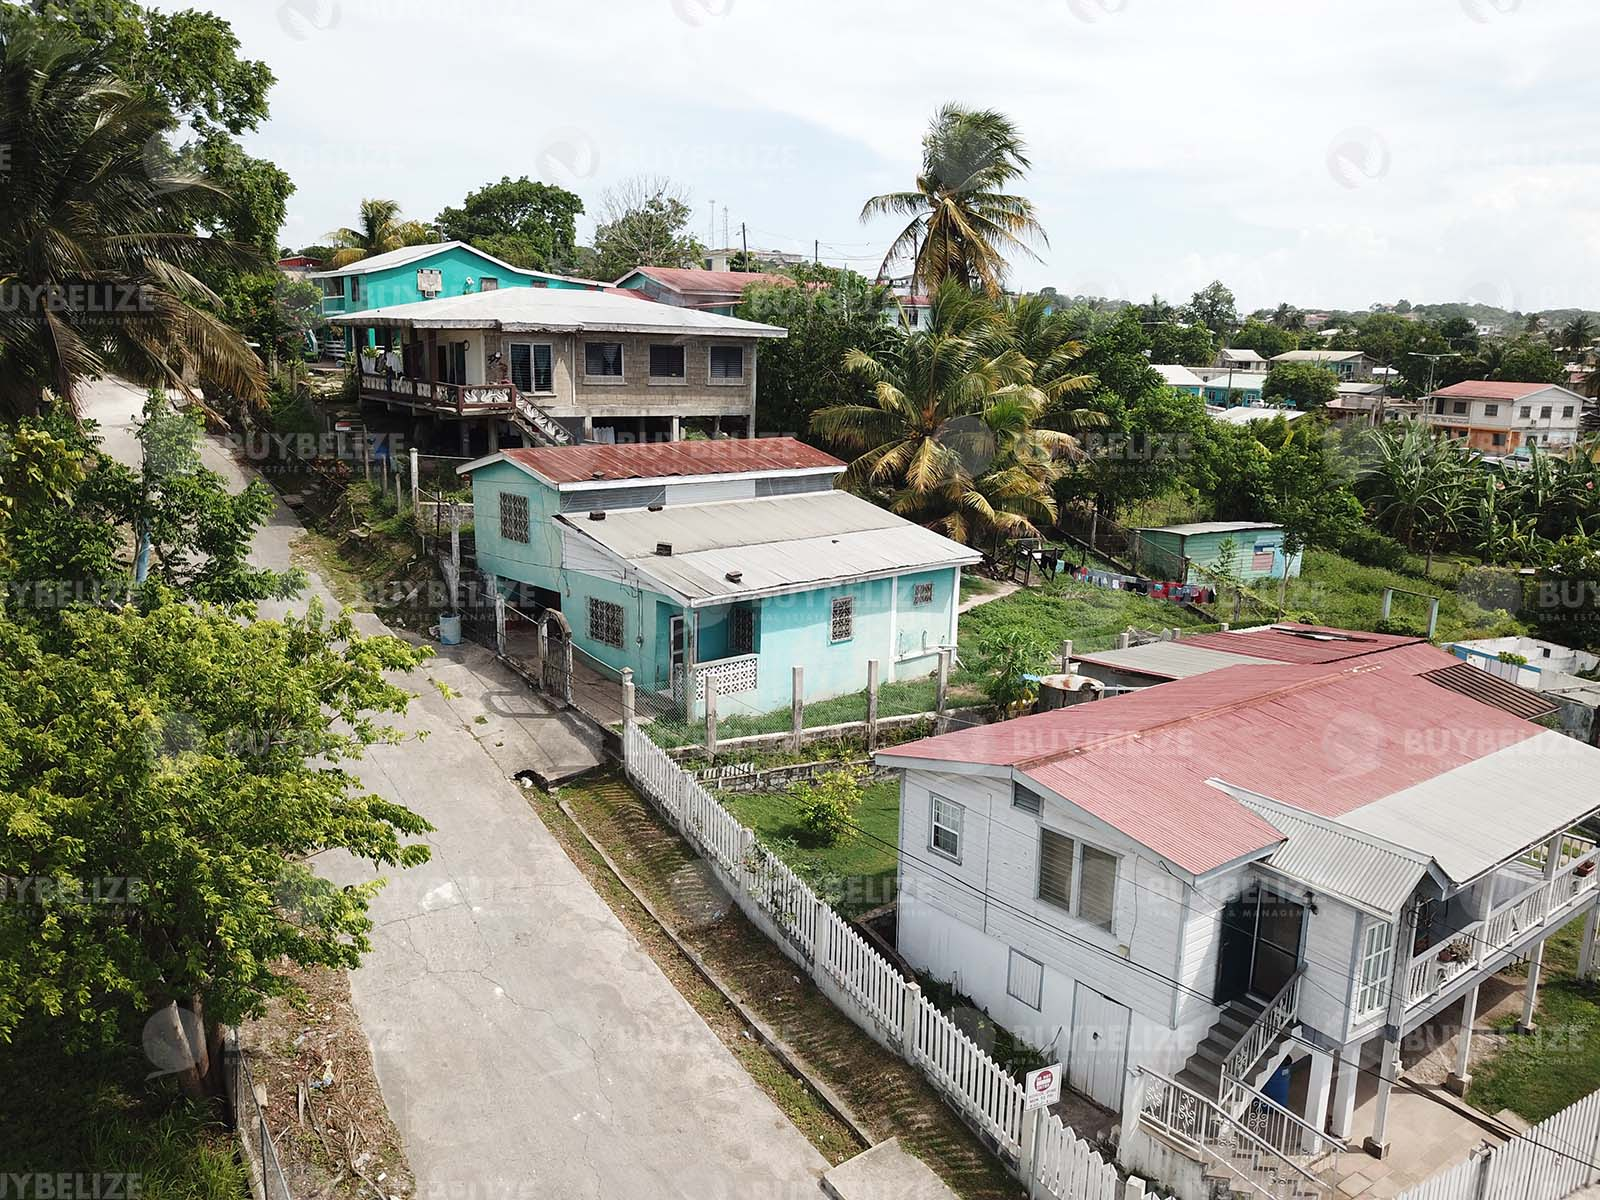 House for Sale in San Ignacio Town Cayo Belize